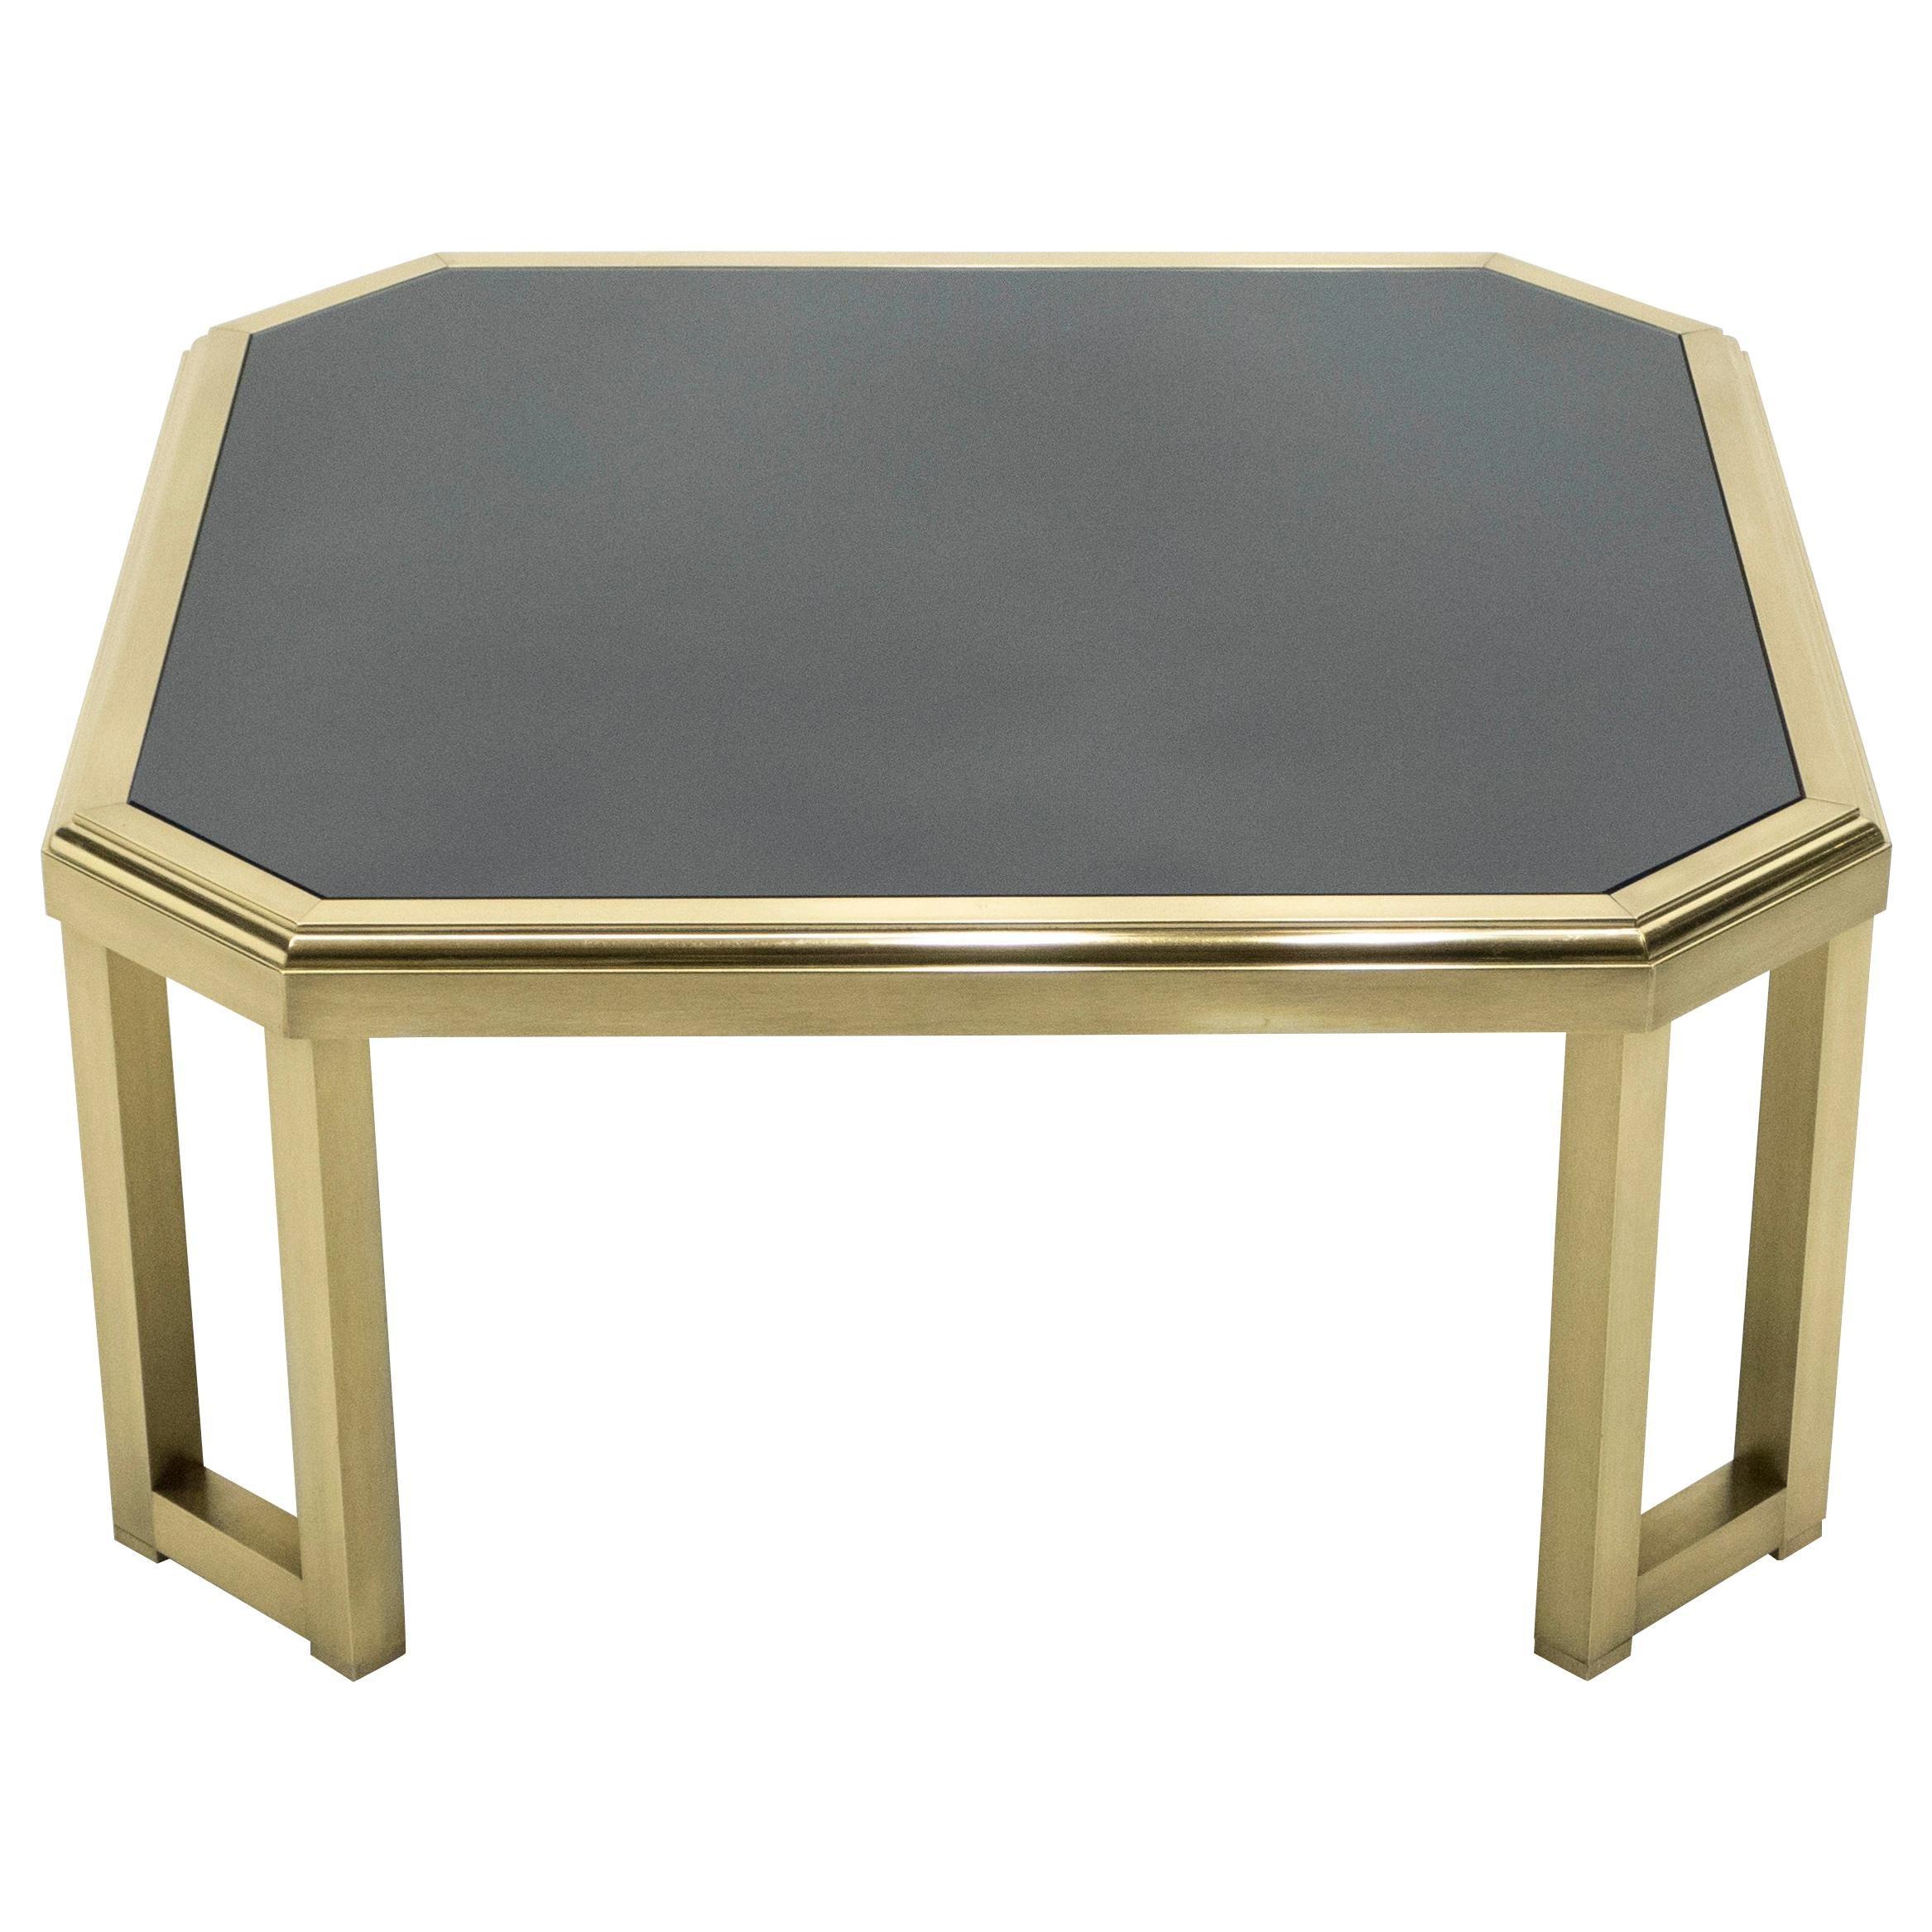 Midcentury Brass Black Opaline End Table by Maison Jansen, 1970s